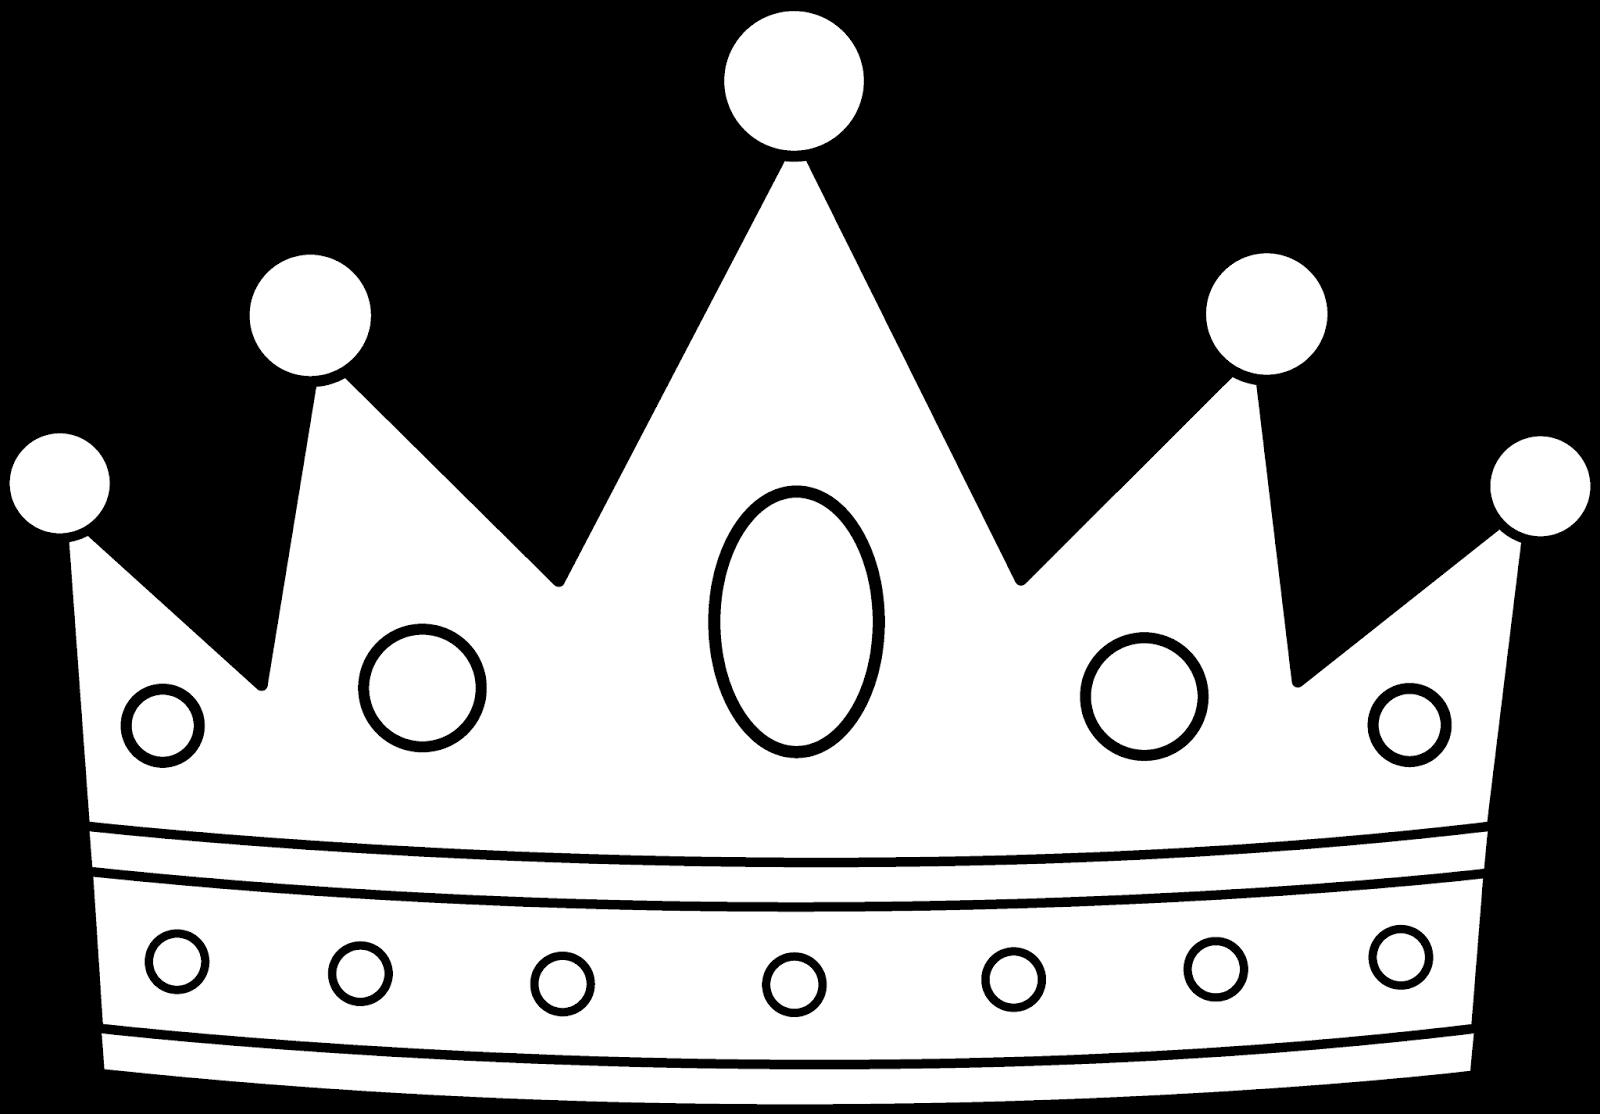 Los dibujos para colorear dibujo de corona para colorear for Paper crown template for adults